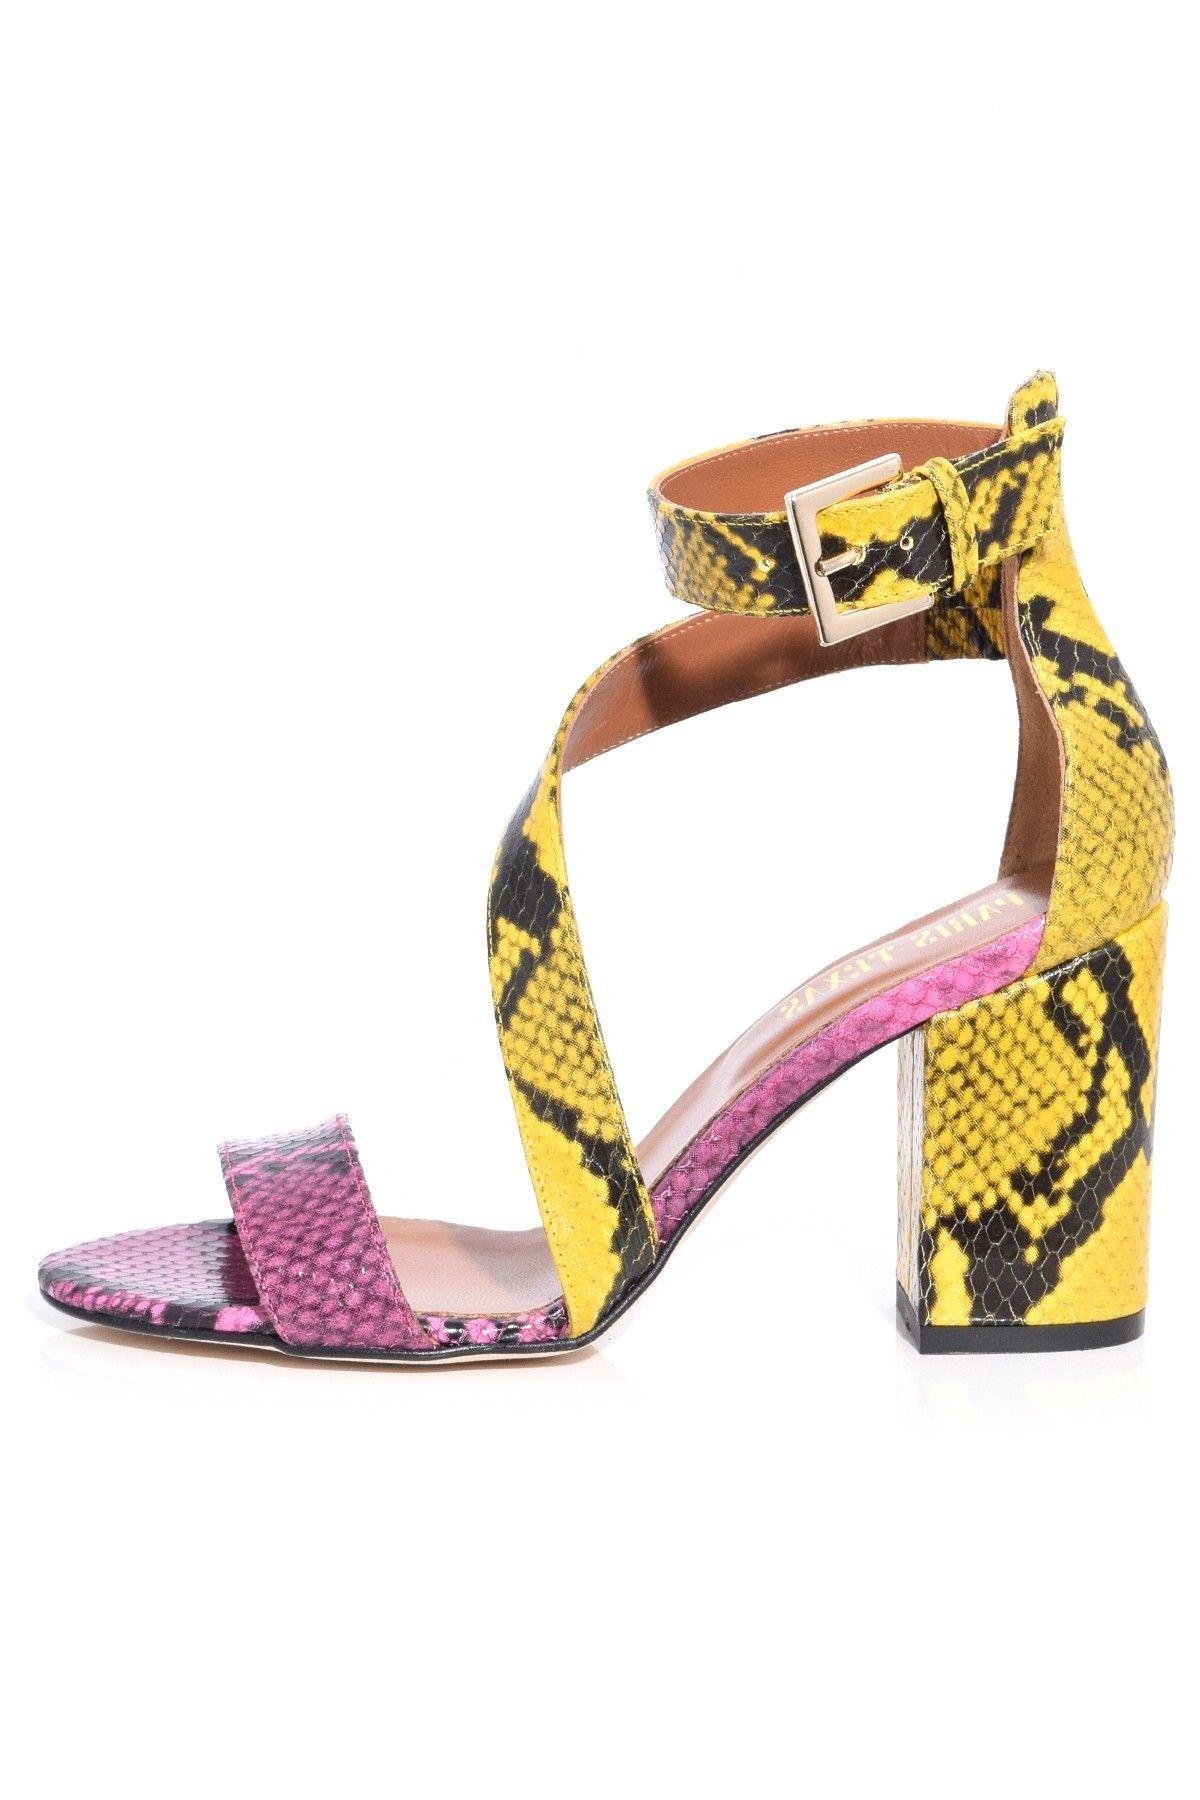 aafed9baa83 Snake Leather Block Heel in Yellow/Fuschia in 2019 | Hampden Shoes ...